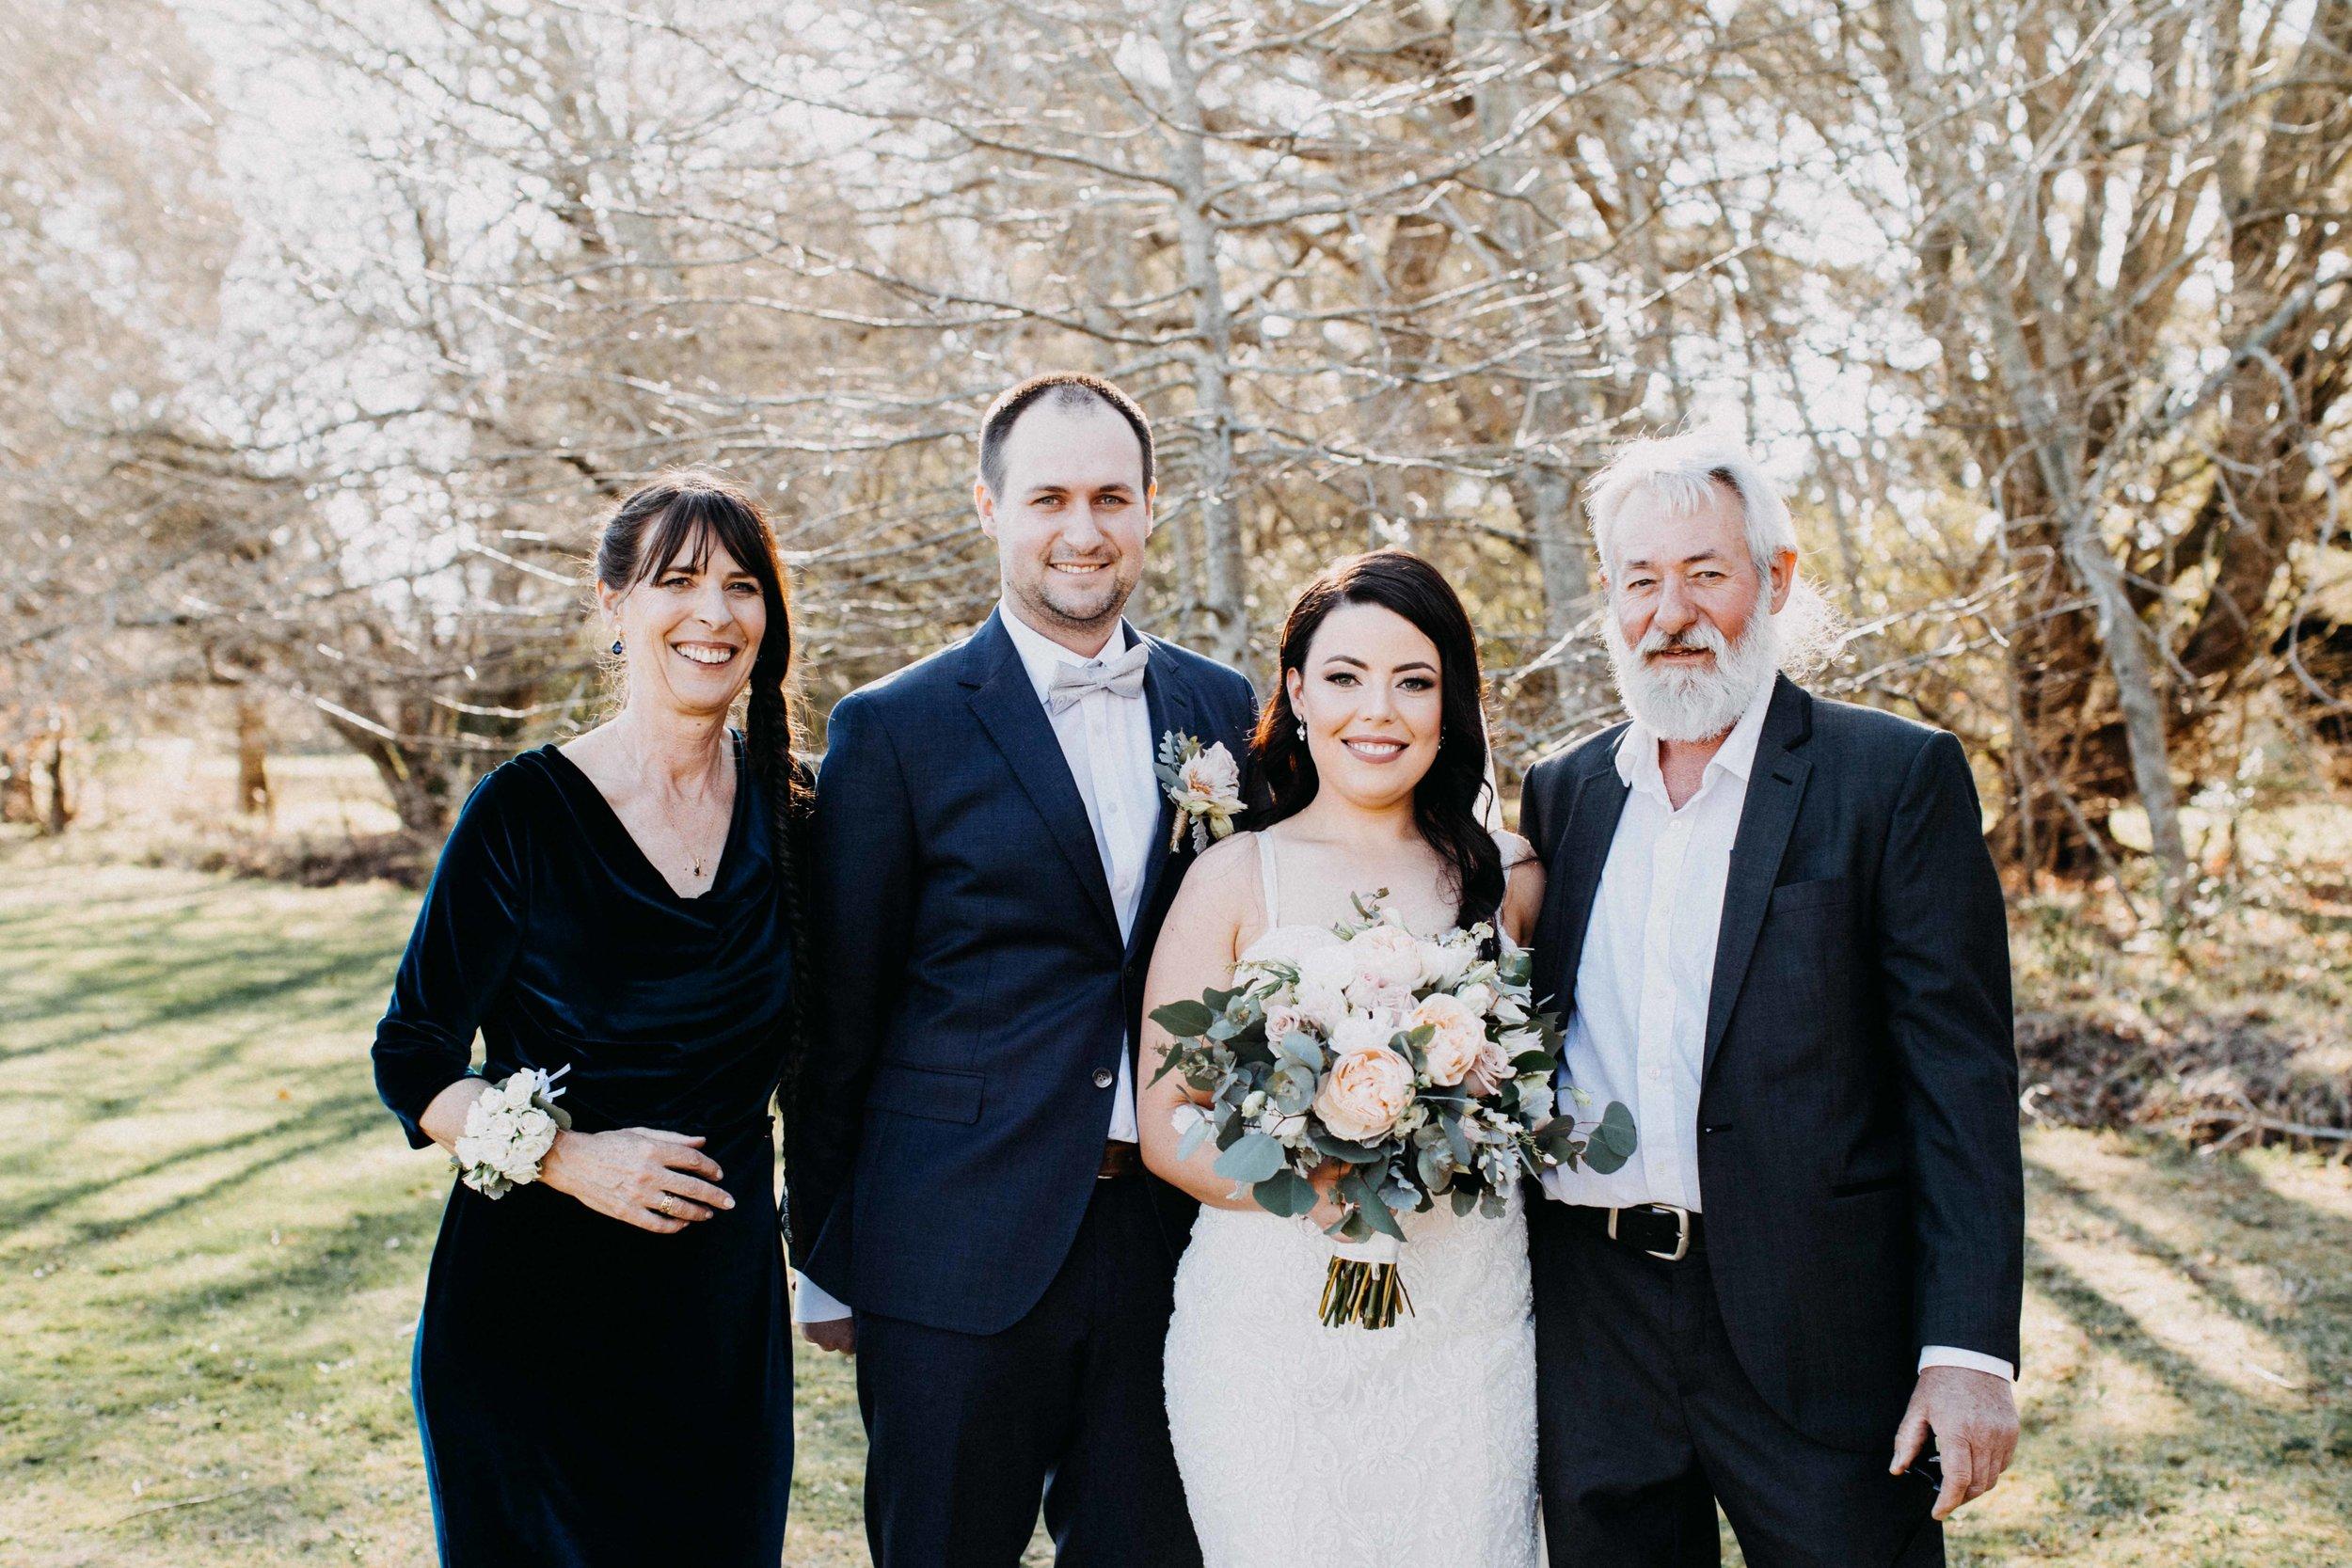 exeter-southern-highlands-wedding-www.emilyobrienphotography.net -76.jpg